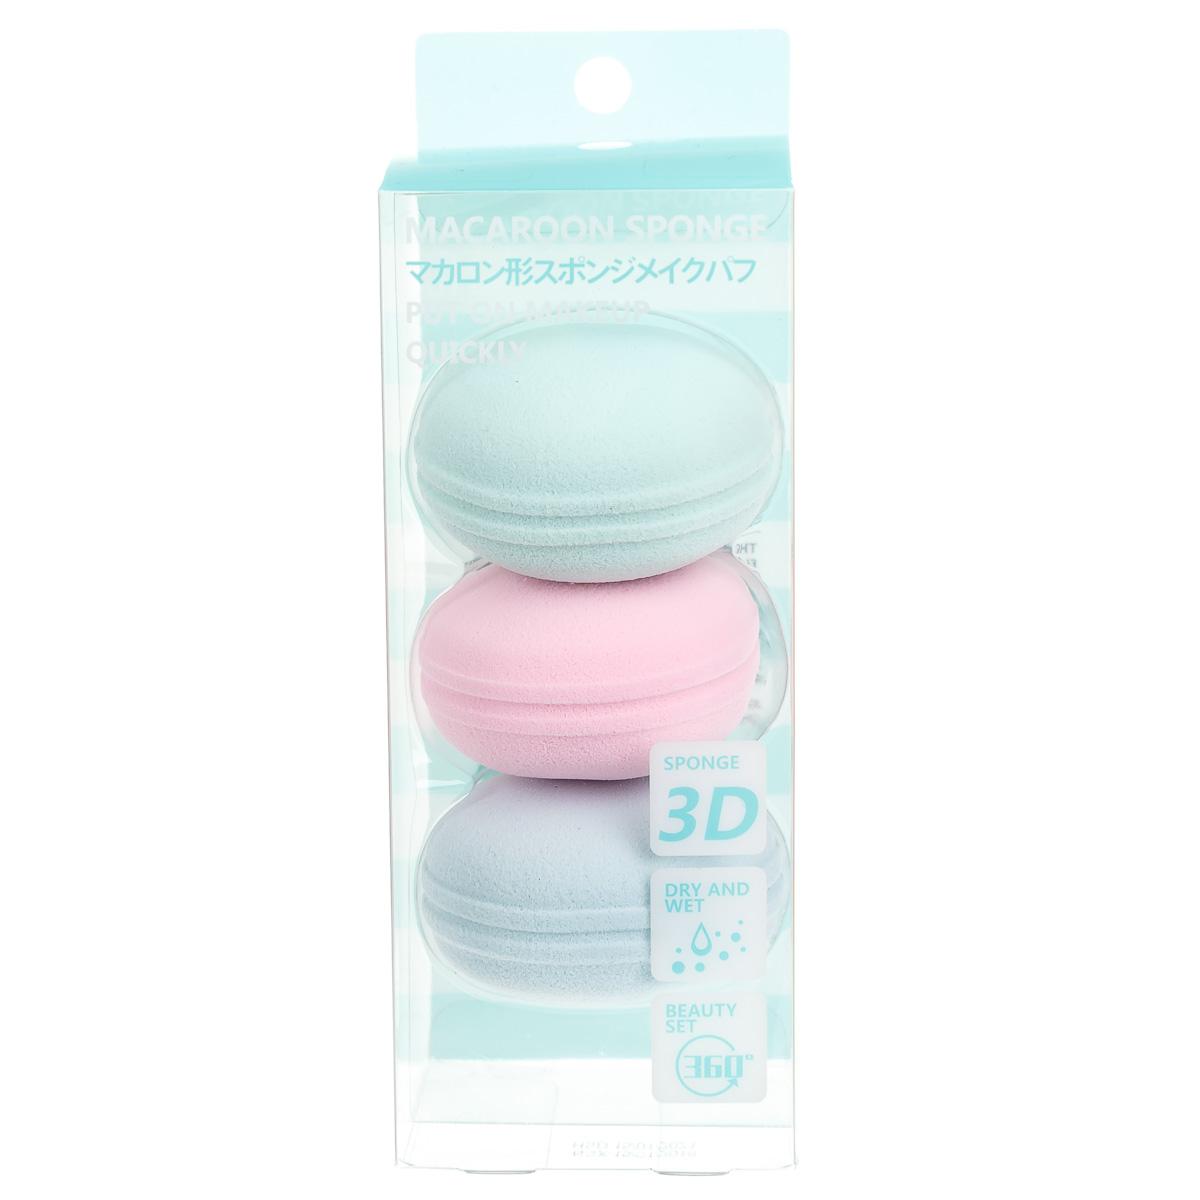 Спонж-макарон для макияжа 3 шт